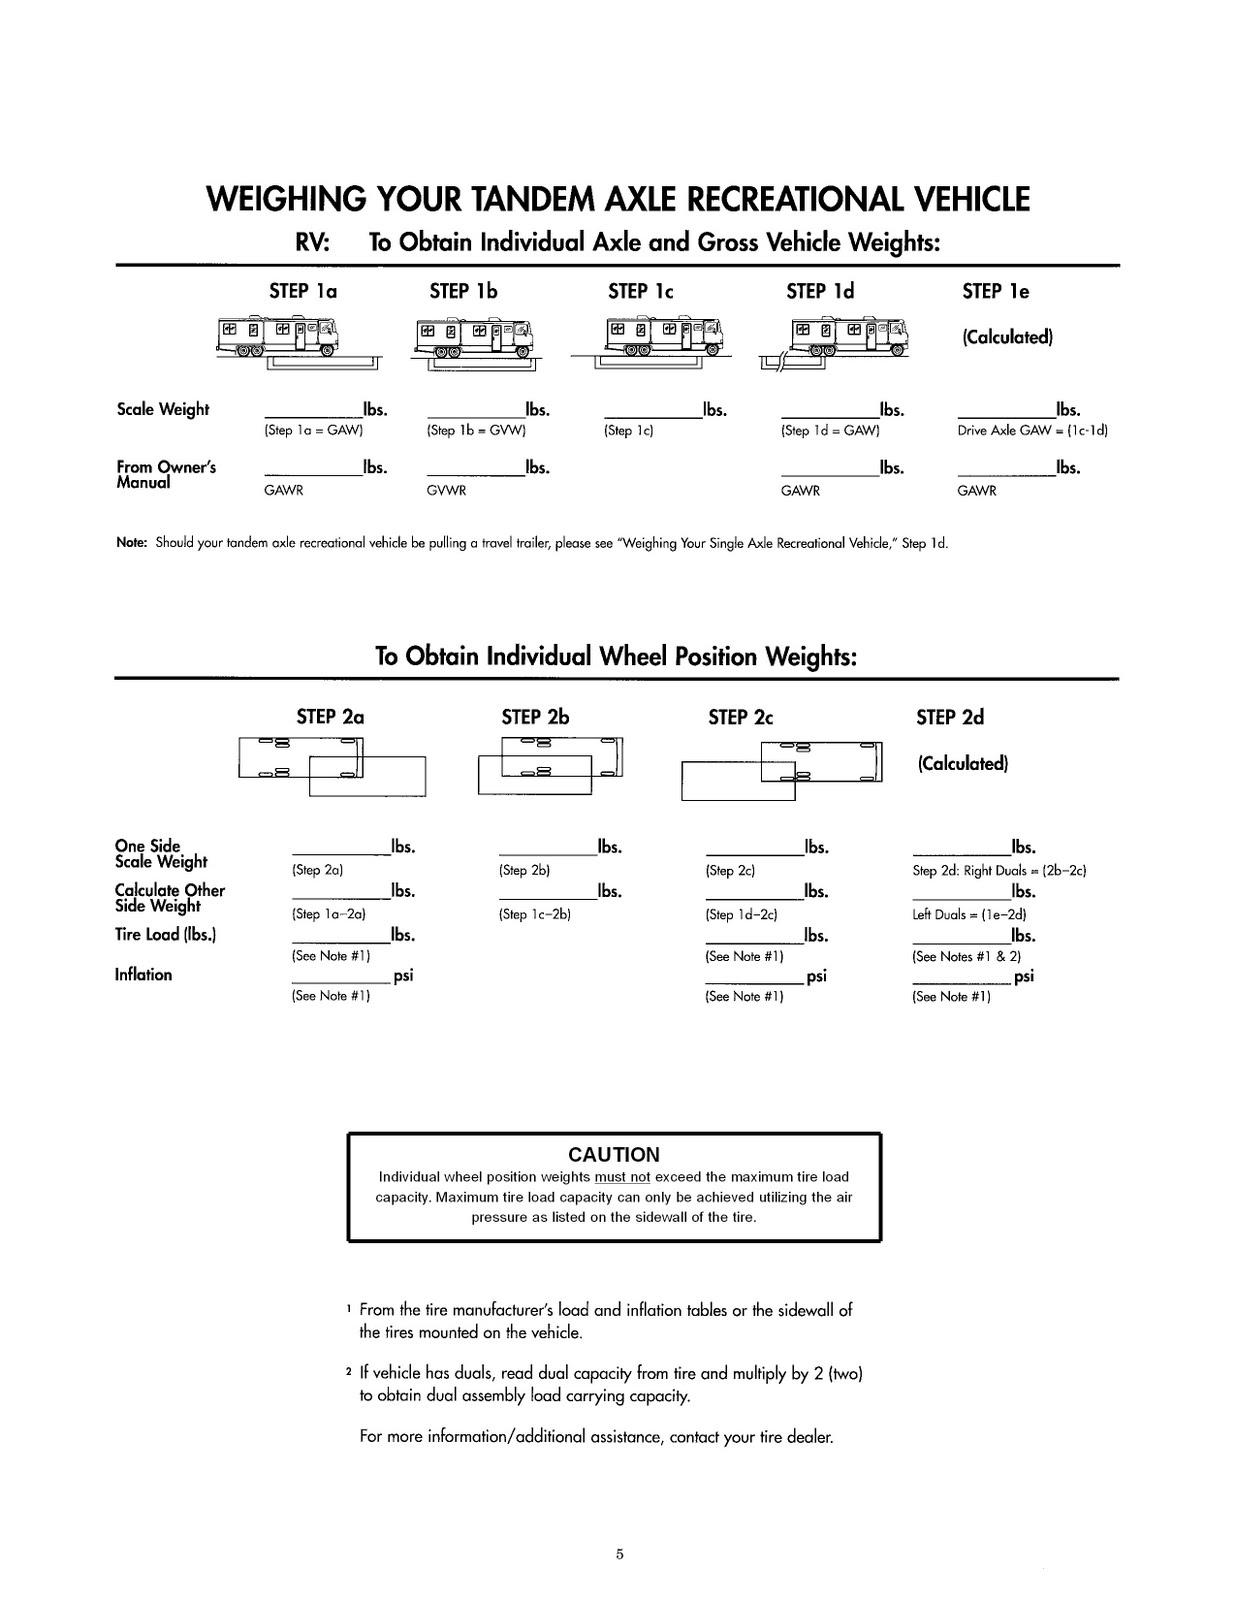 Fleetwood Eccursion rv owners Manual